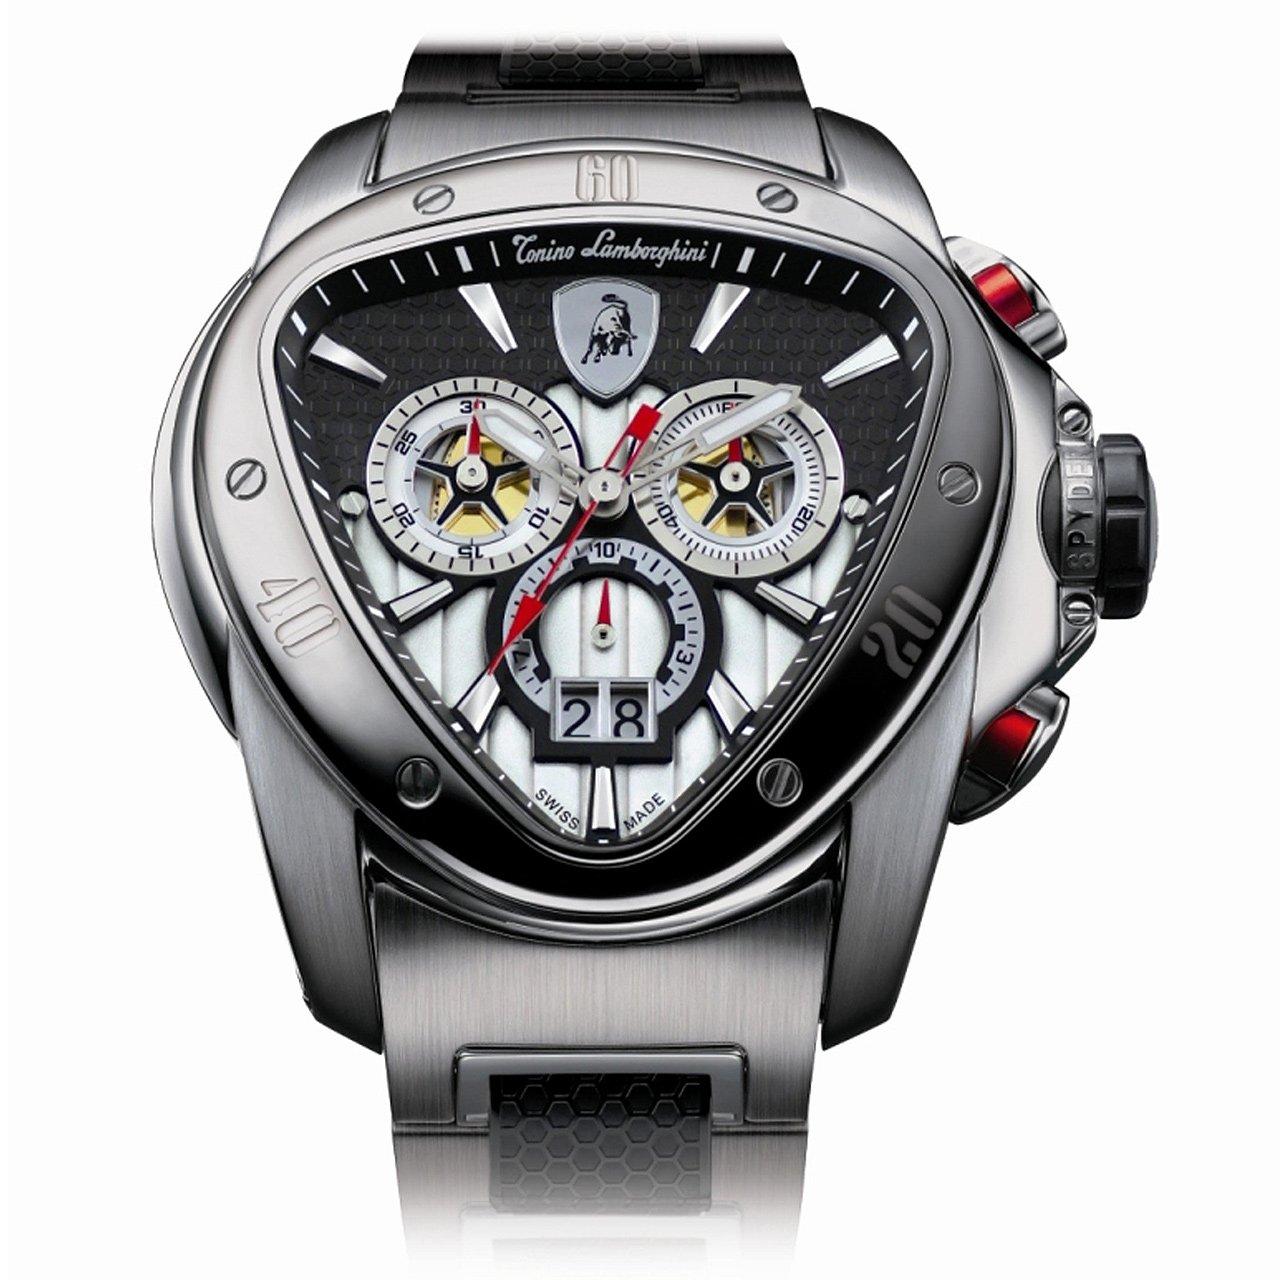 Amazon Com Tonino Lamborghini Spyder Chronograph 1000 Watch Watches